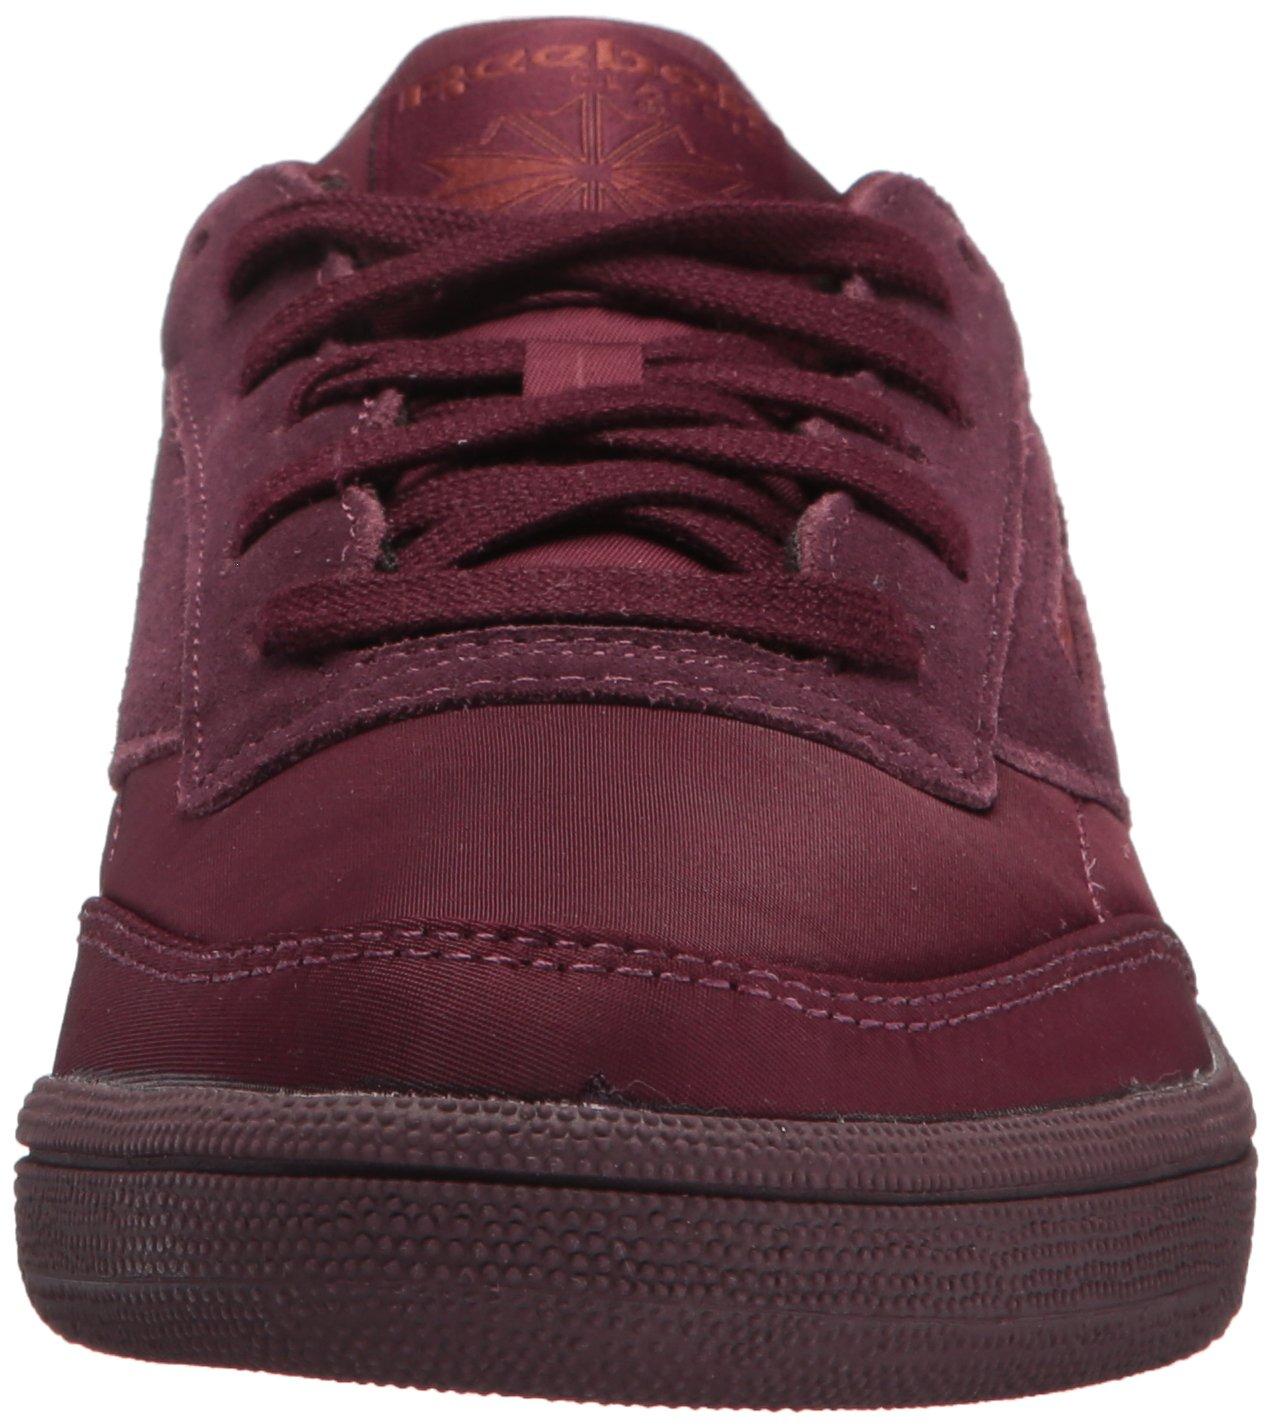 Reebok Women's Club C 85 Soft Sneaker B074TSLKW4 8.5 B(M) US|Dark Red/Rust Met